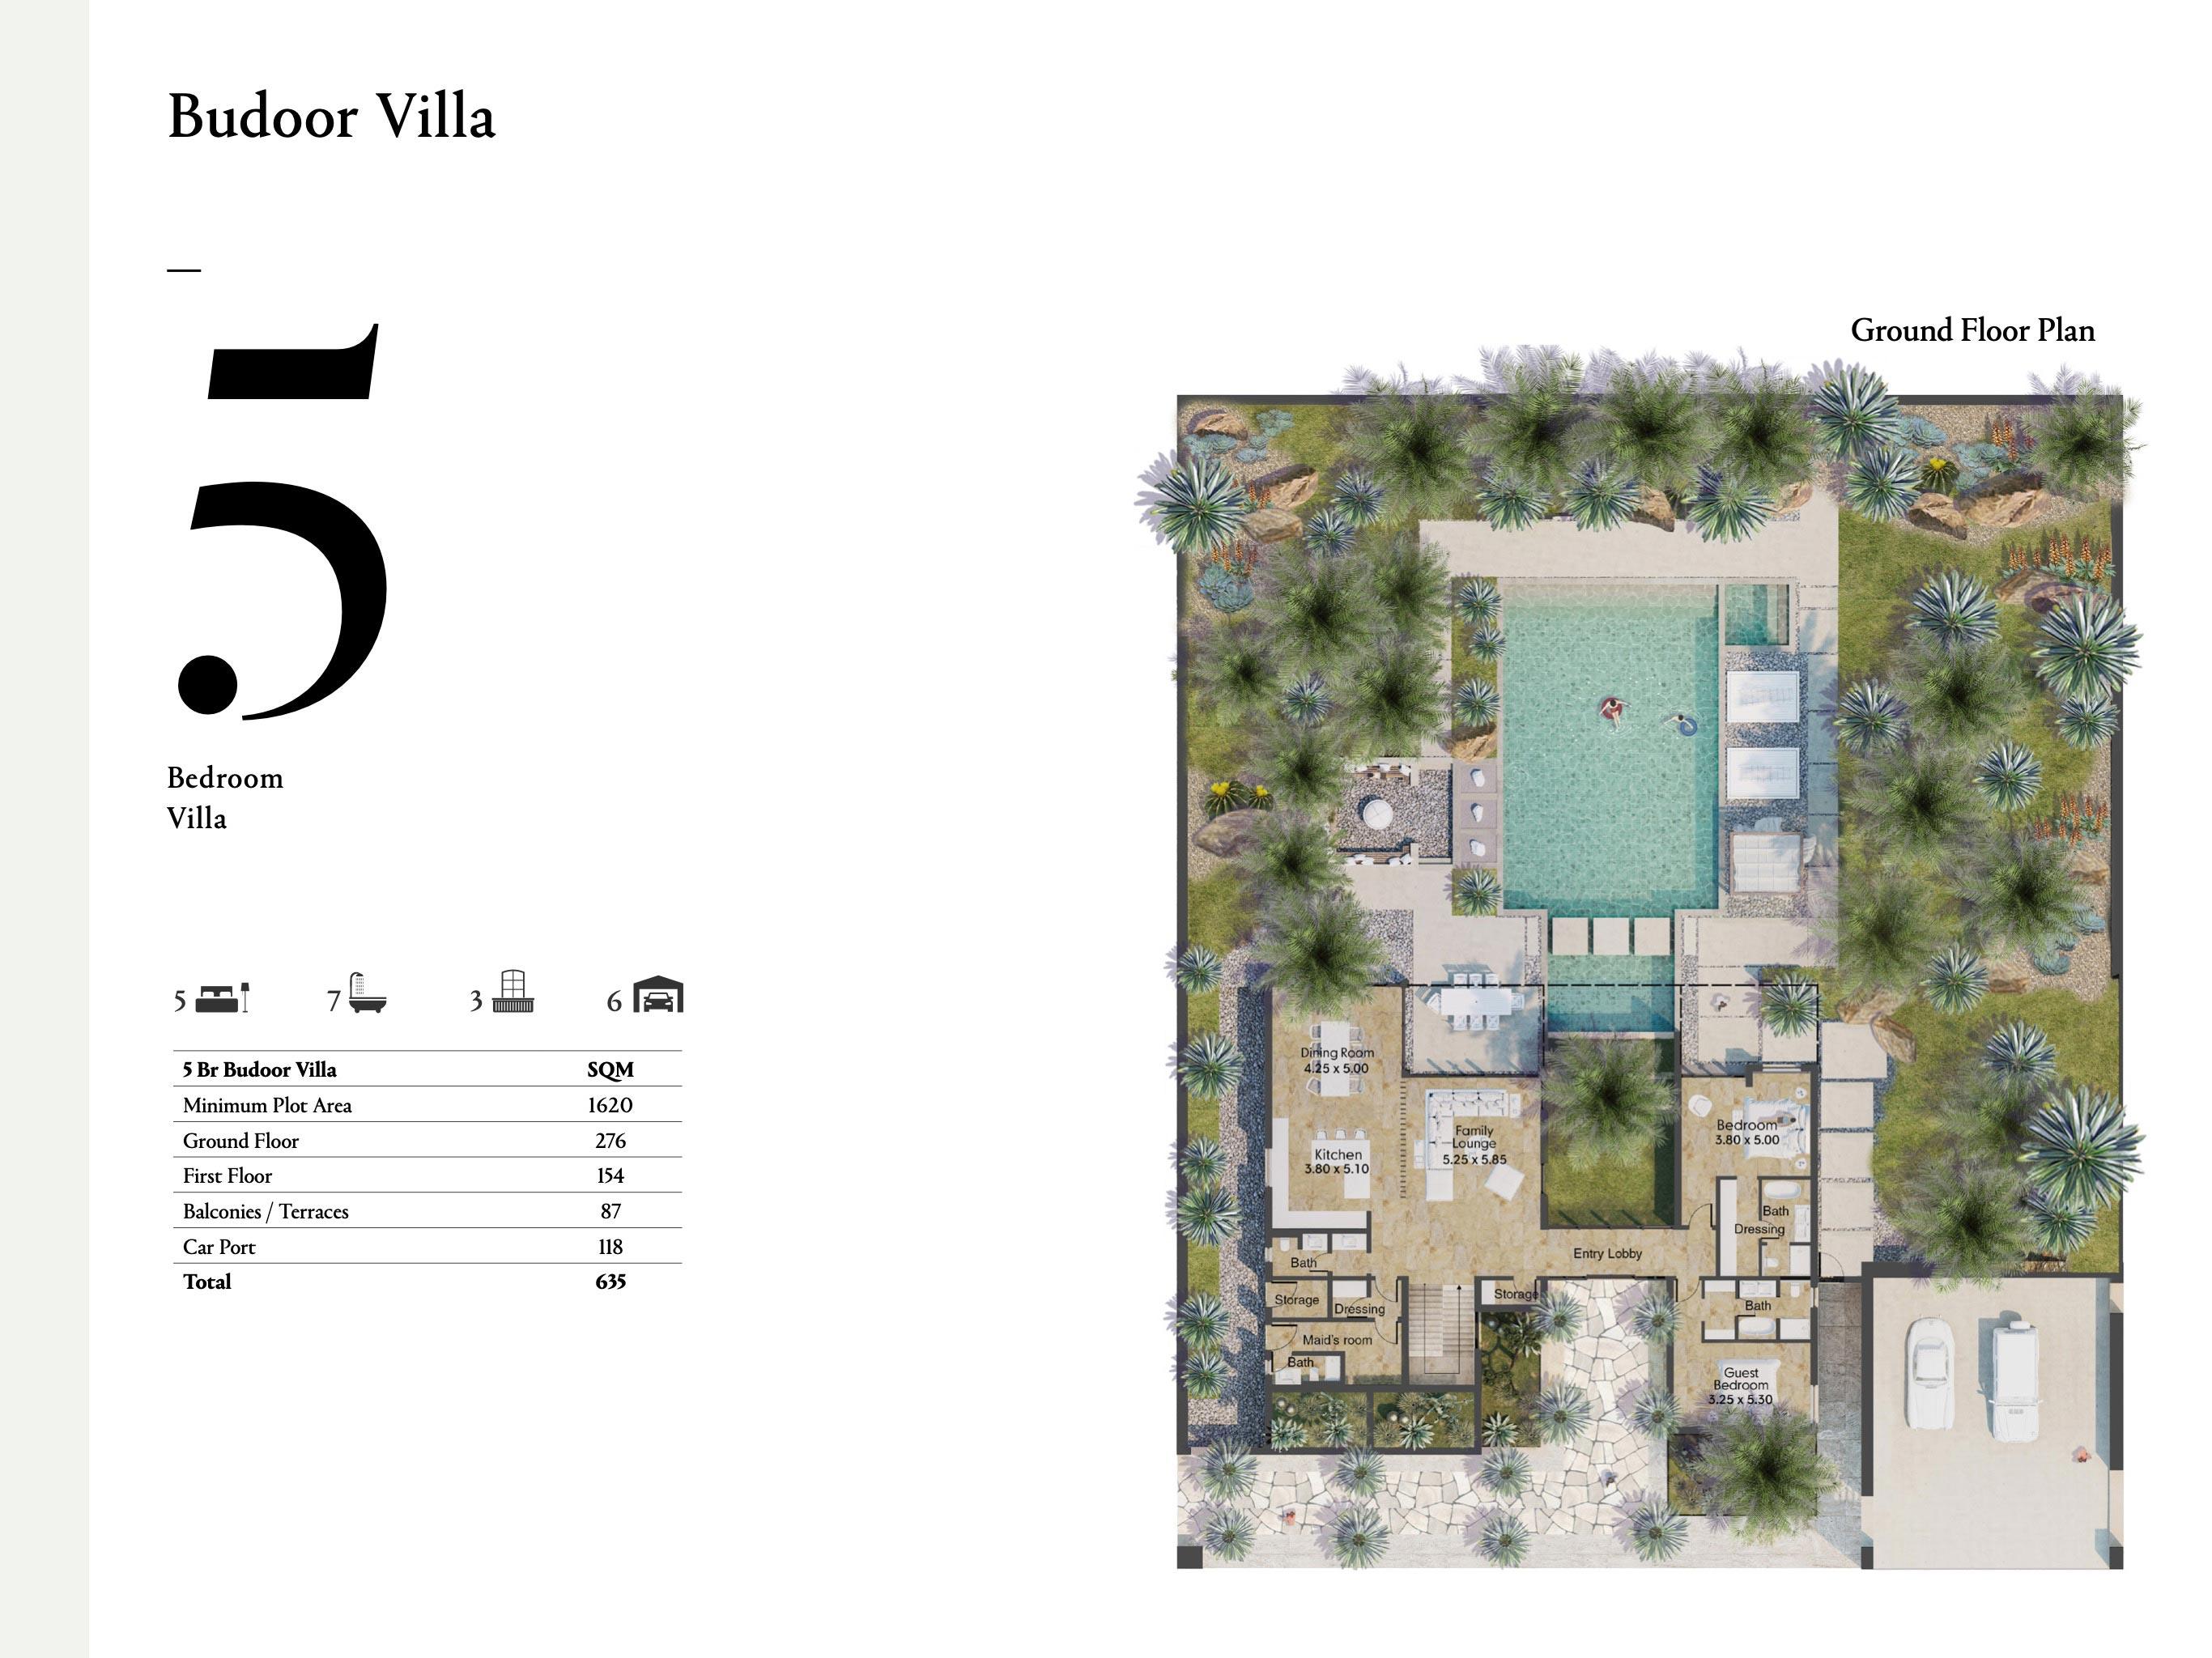 Budoor Villa - 5 Bedroom with a size area of 635 sqm